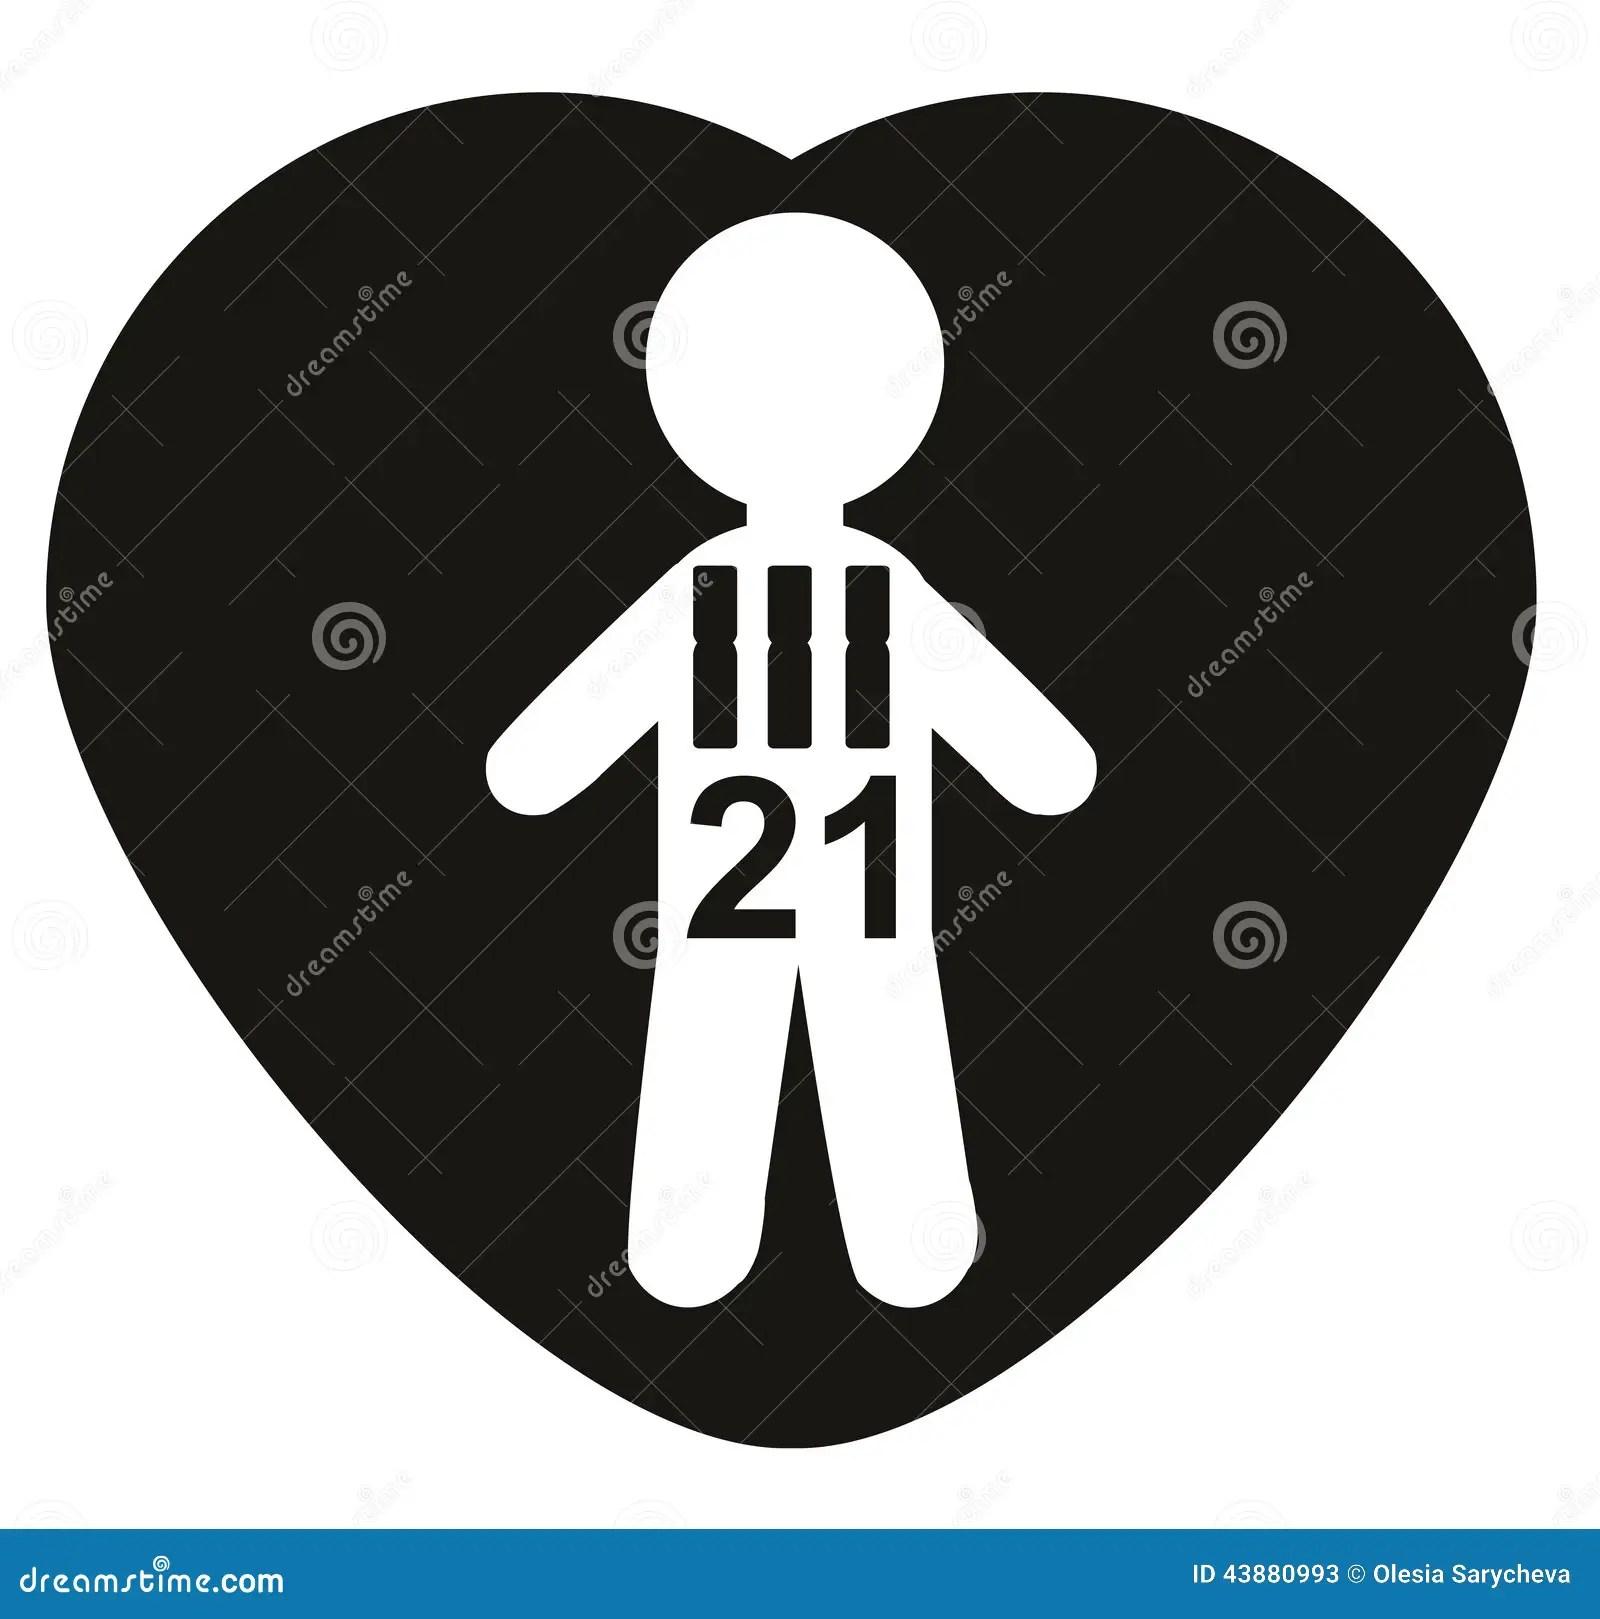 Chromosomes 21 Trisomy 21 Down Syndrome Concept Stock